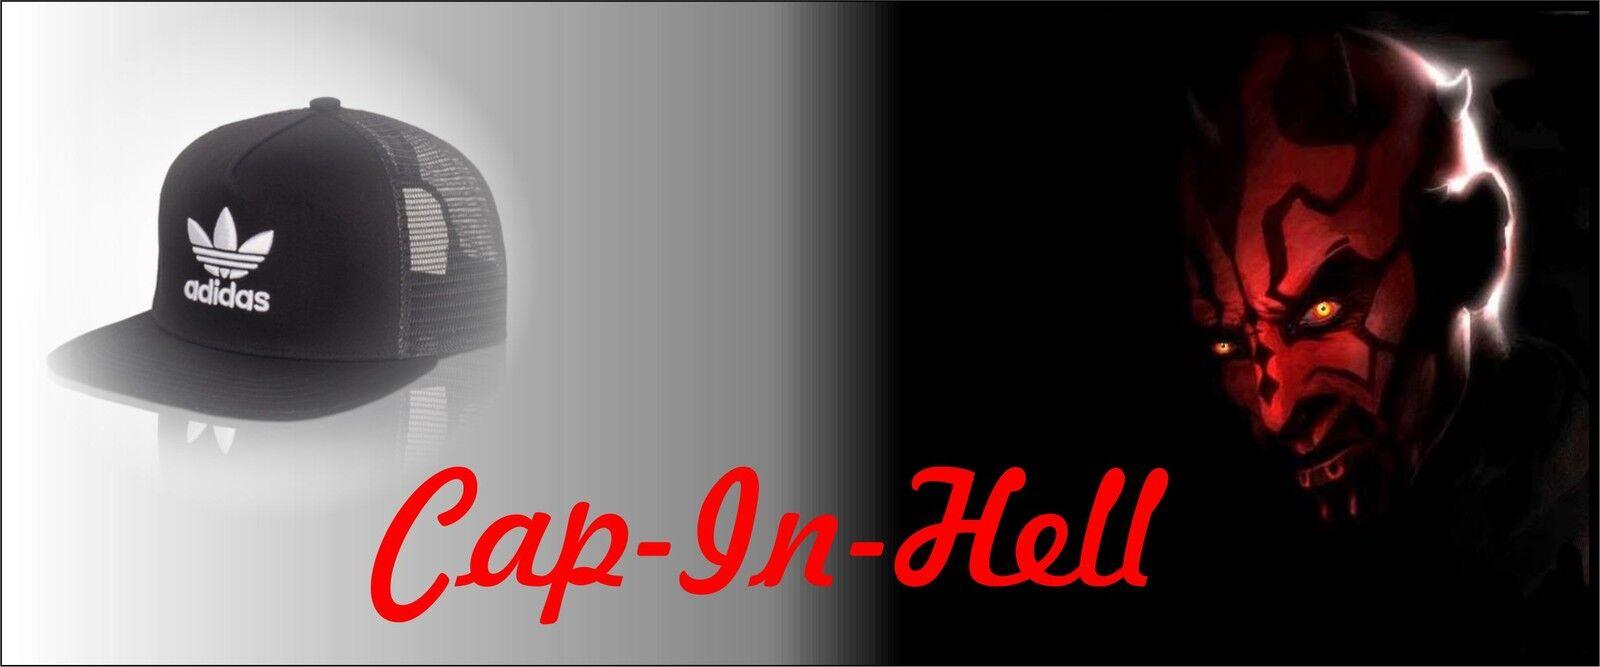 Cap-In-Hell